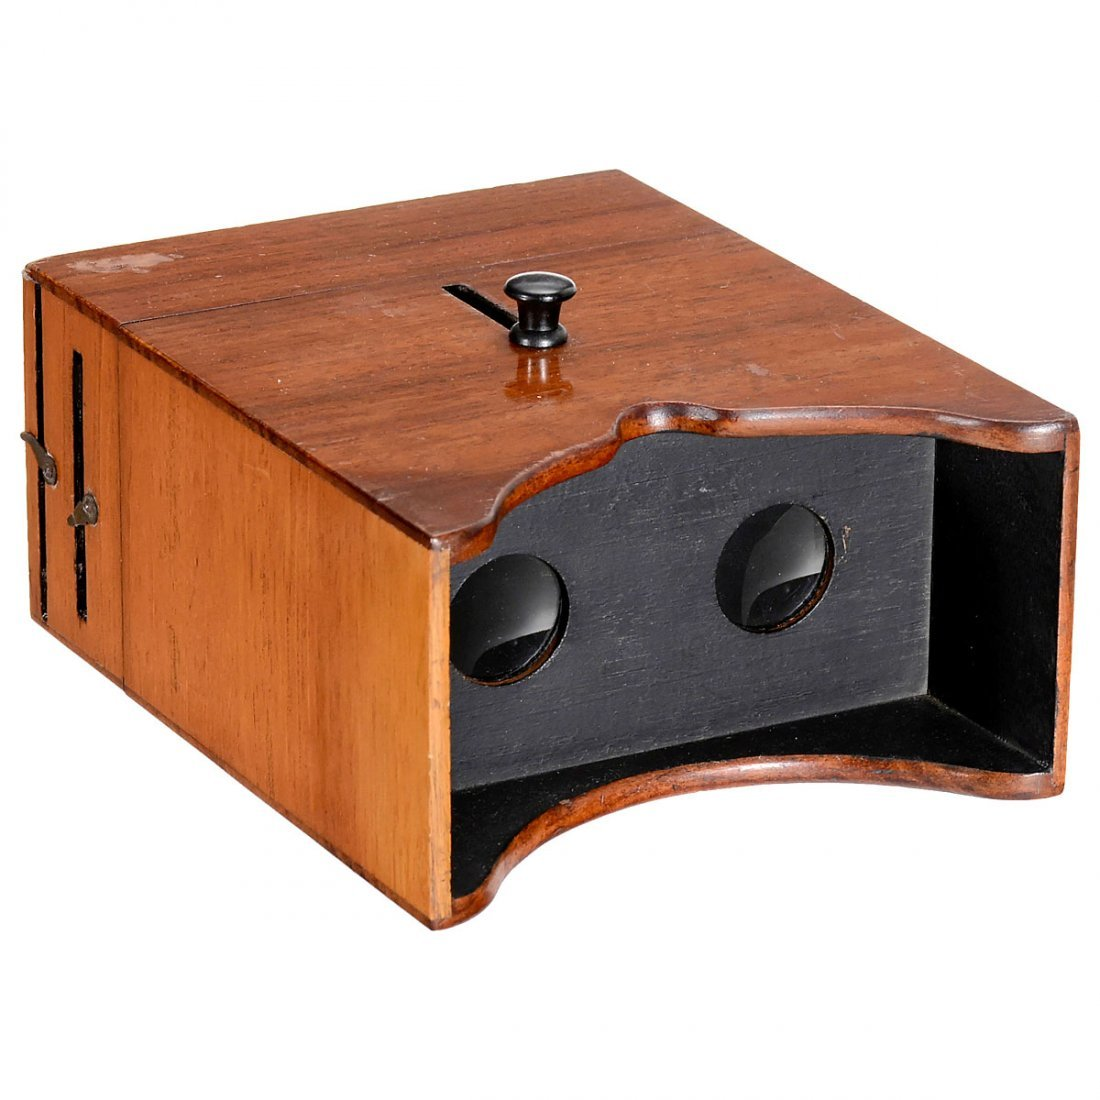 Hand Stereo Viewer 6 x 13, c. 1900